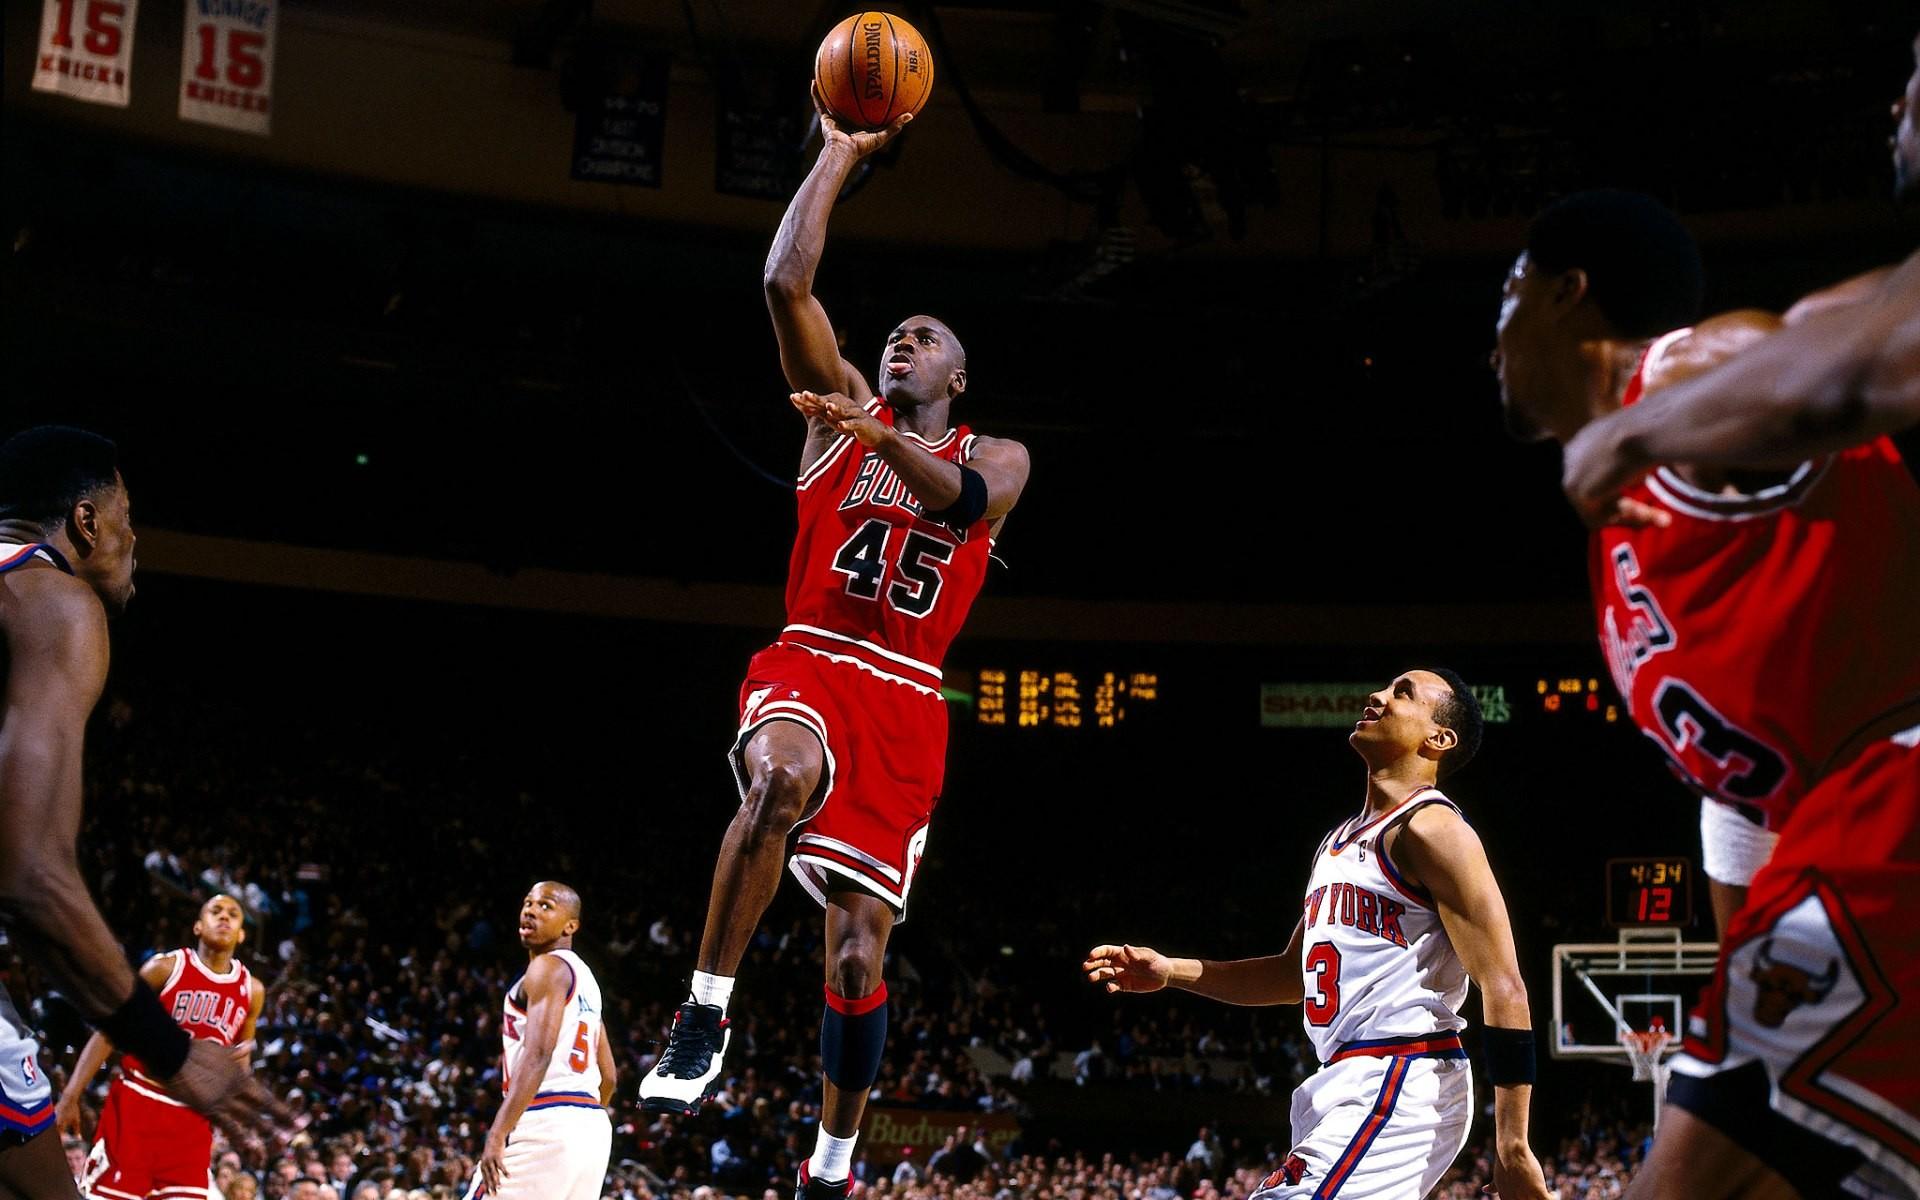 Michael Jordan Jump To Slam Dunk Image Gallery Wallpaper HD Desktop .